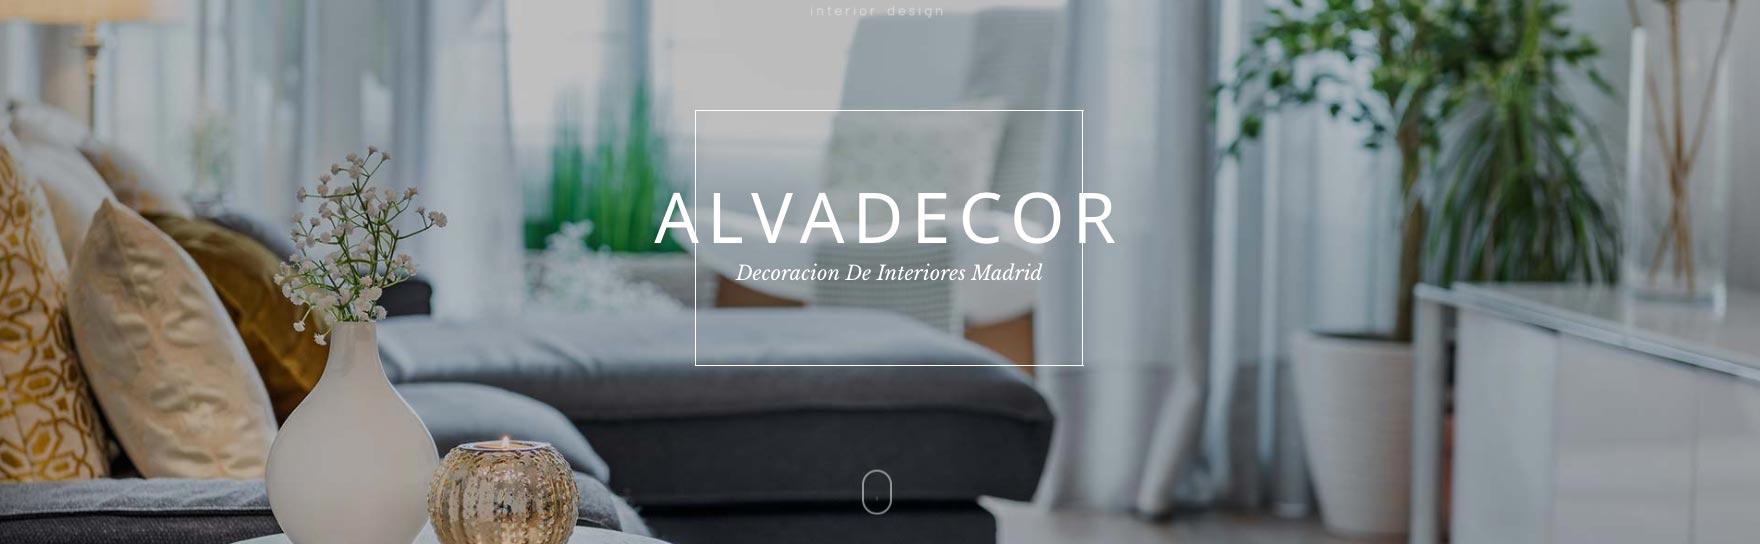 Nueva Web Alvadecor